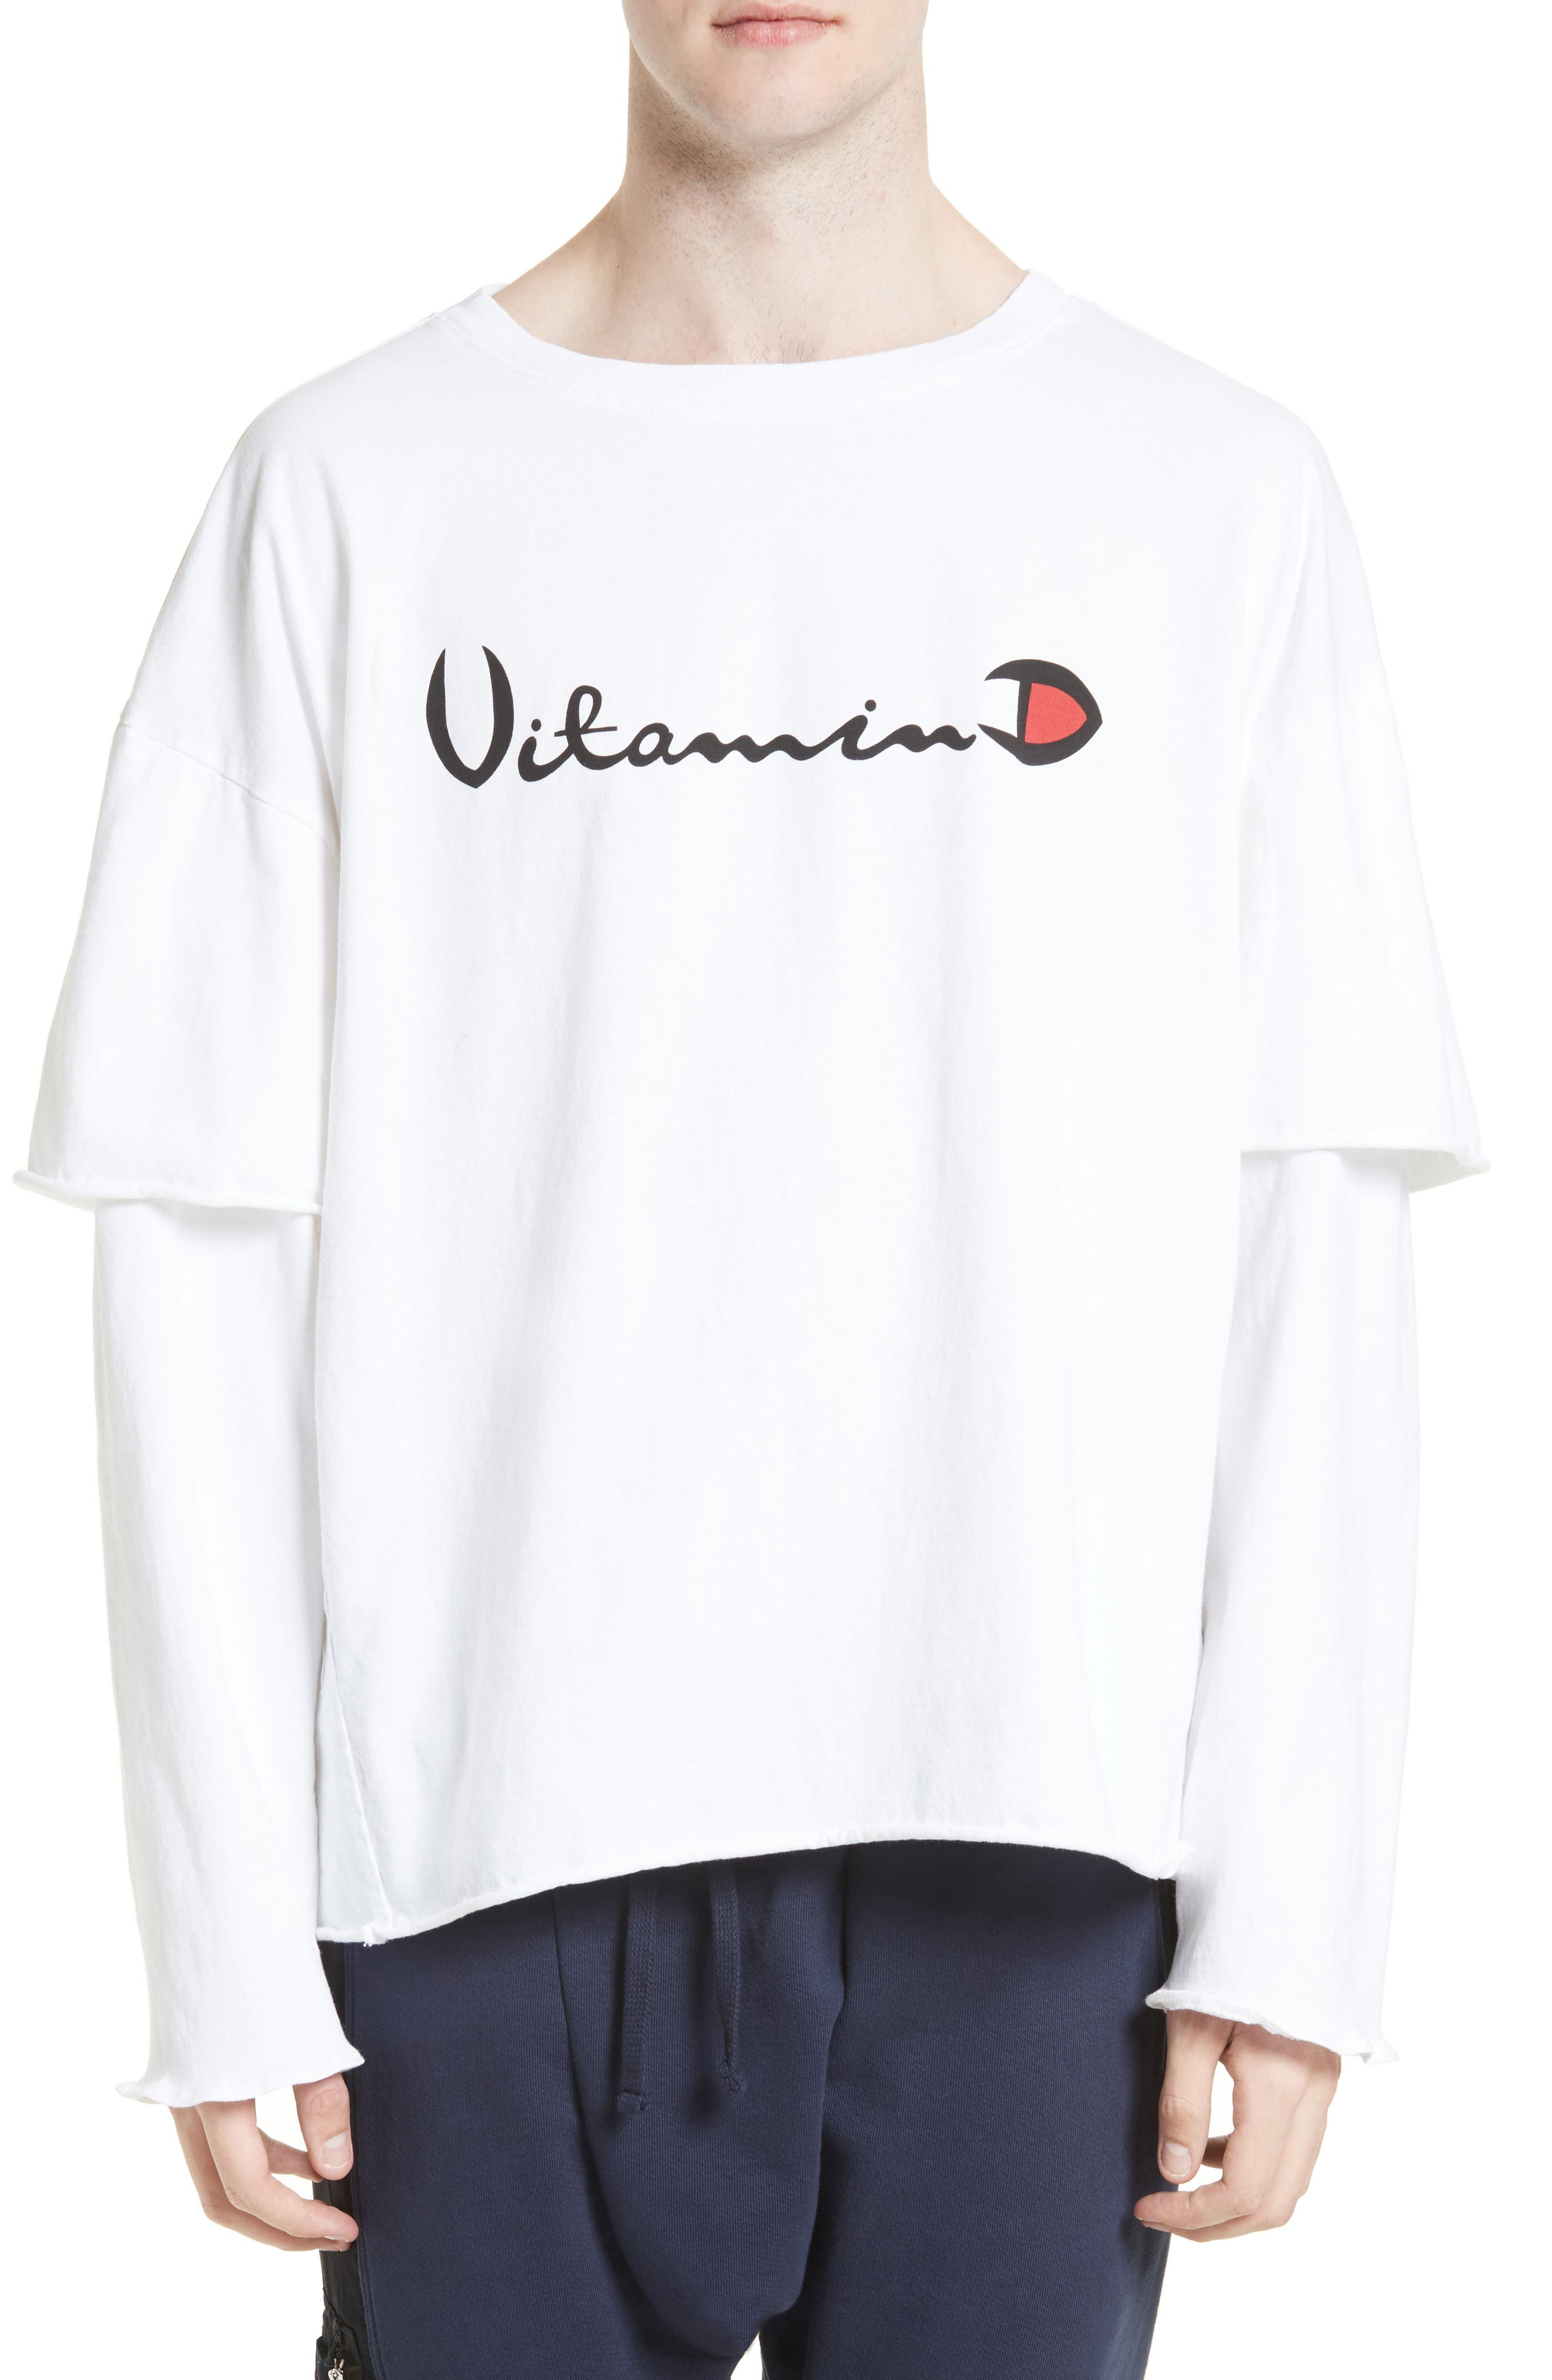 Drifter Filius Vitamin D Graphic T-Shirt